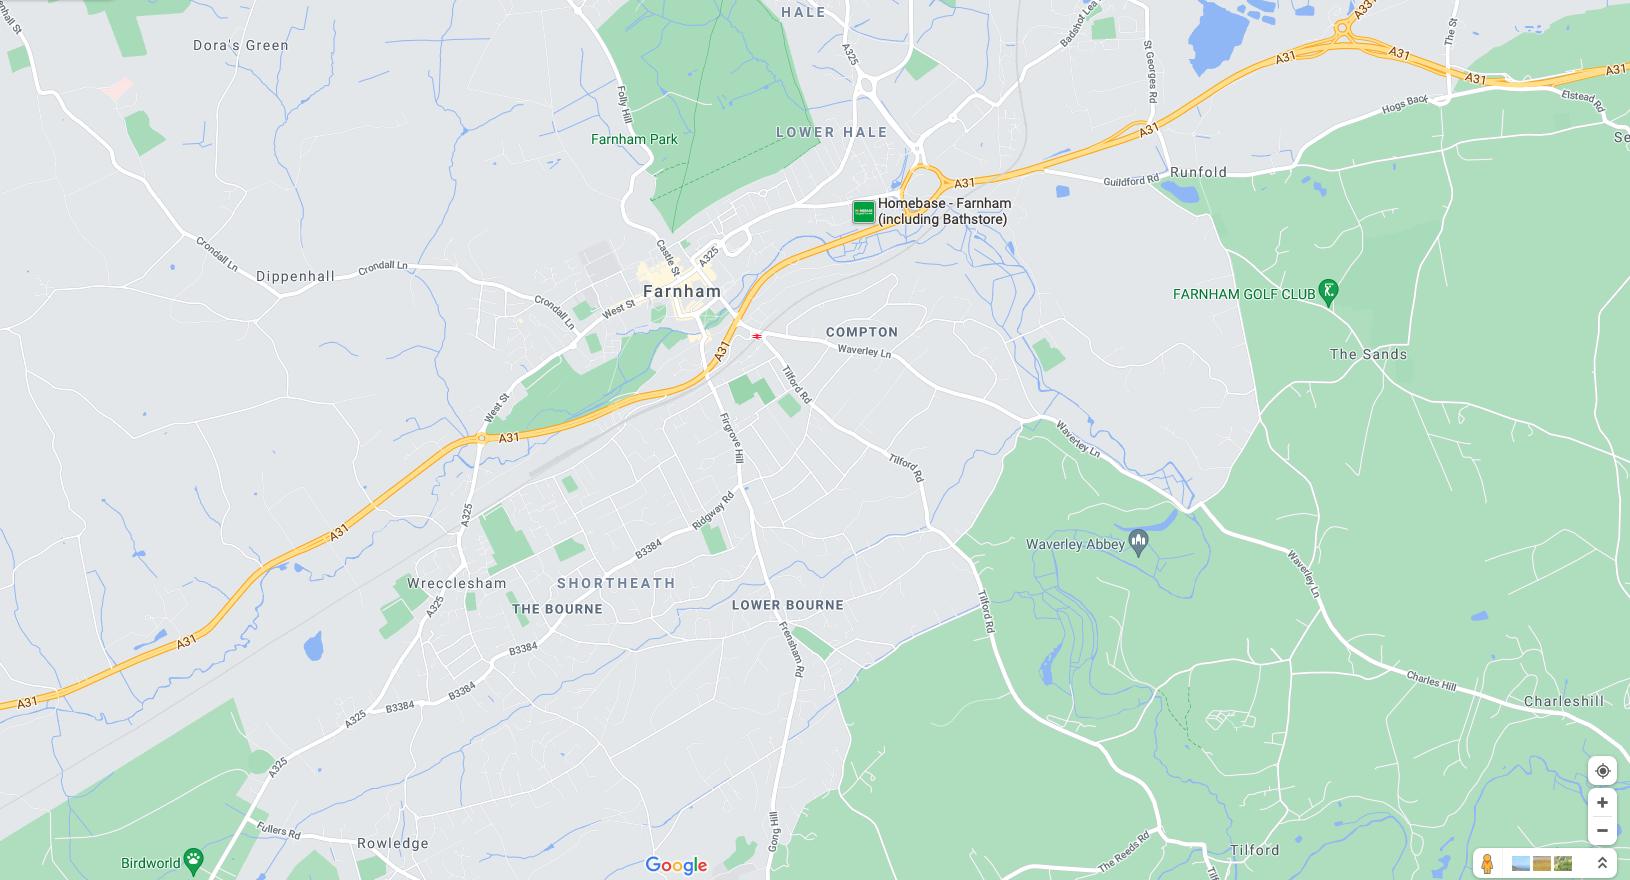 Map of Farnham